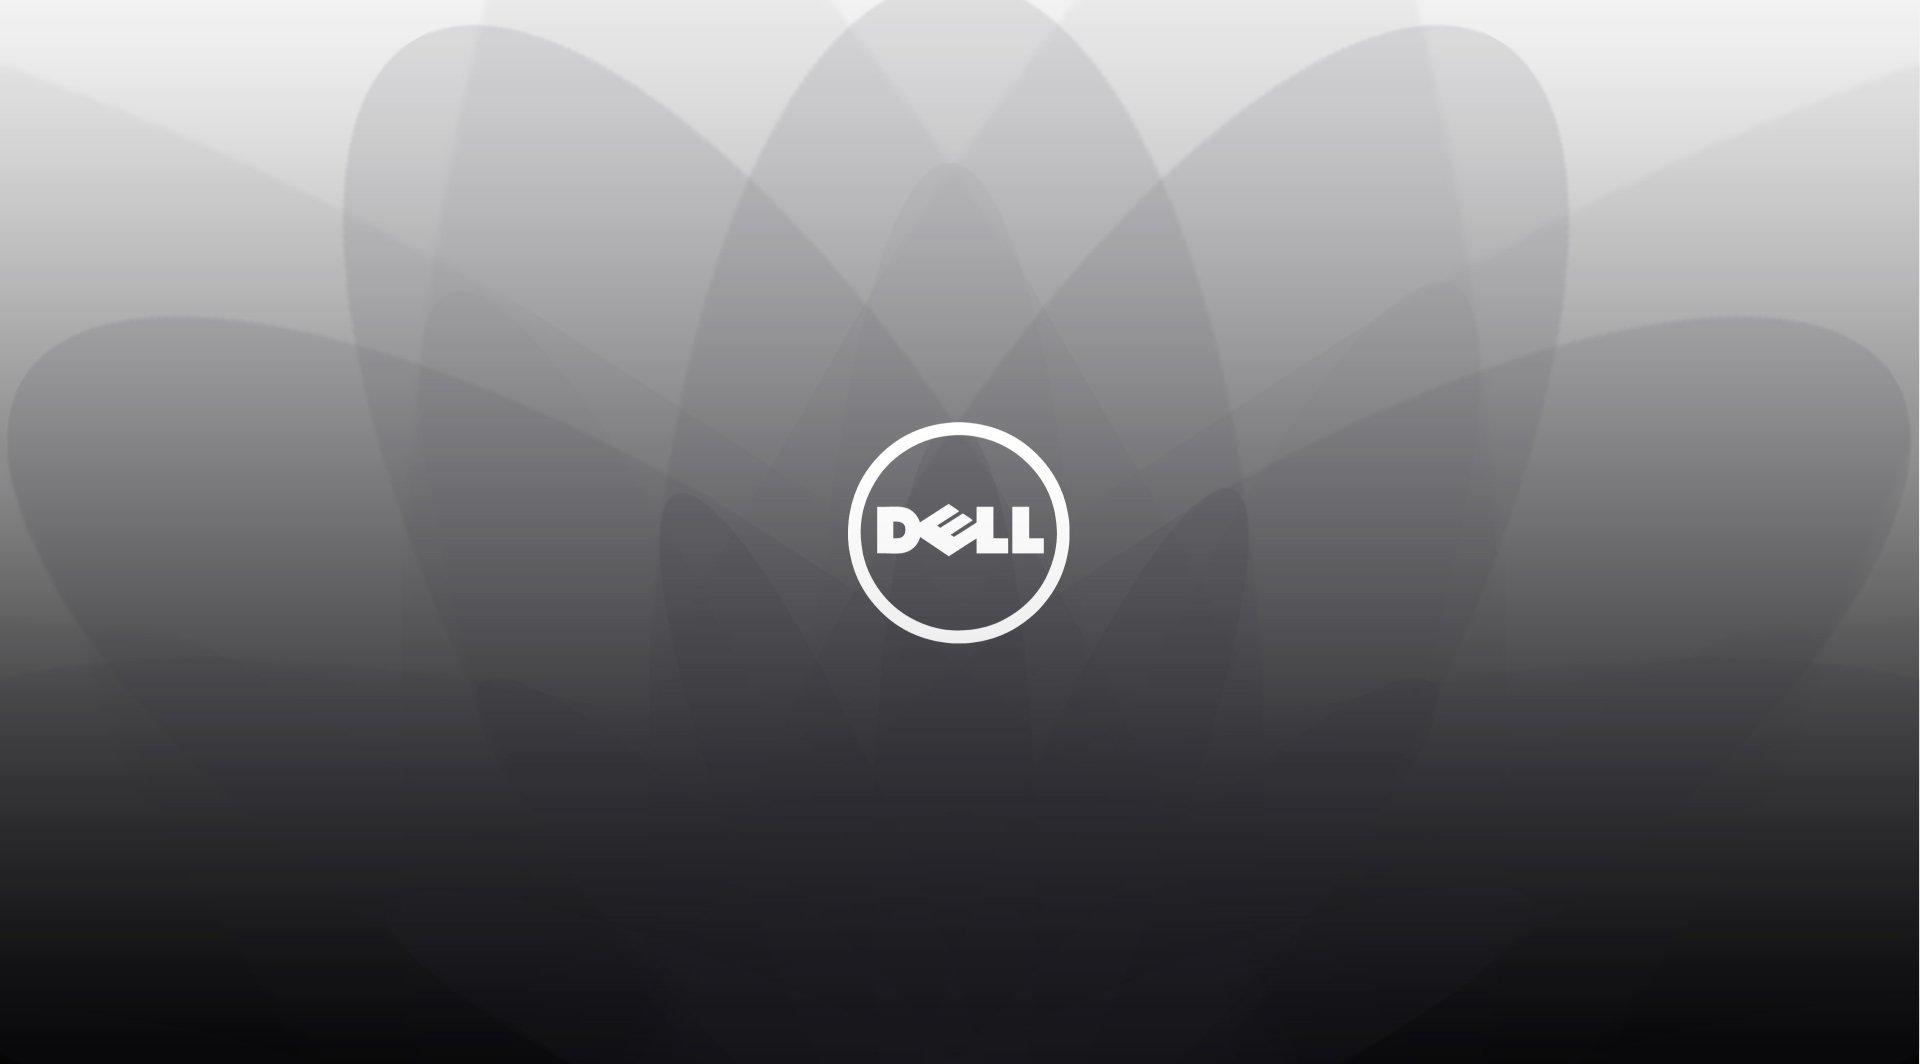 Technology - Dell  Wallpaper